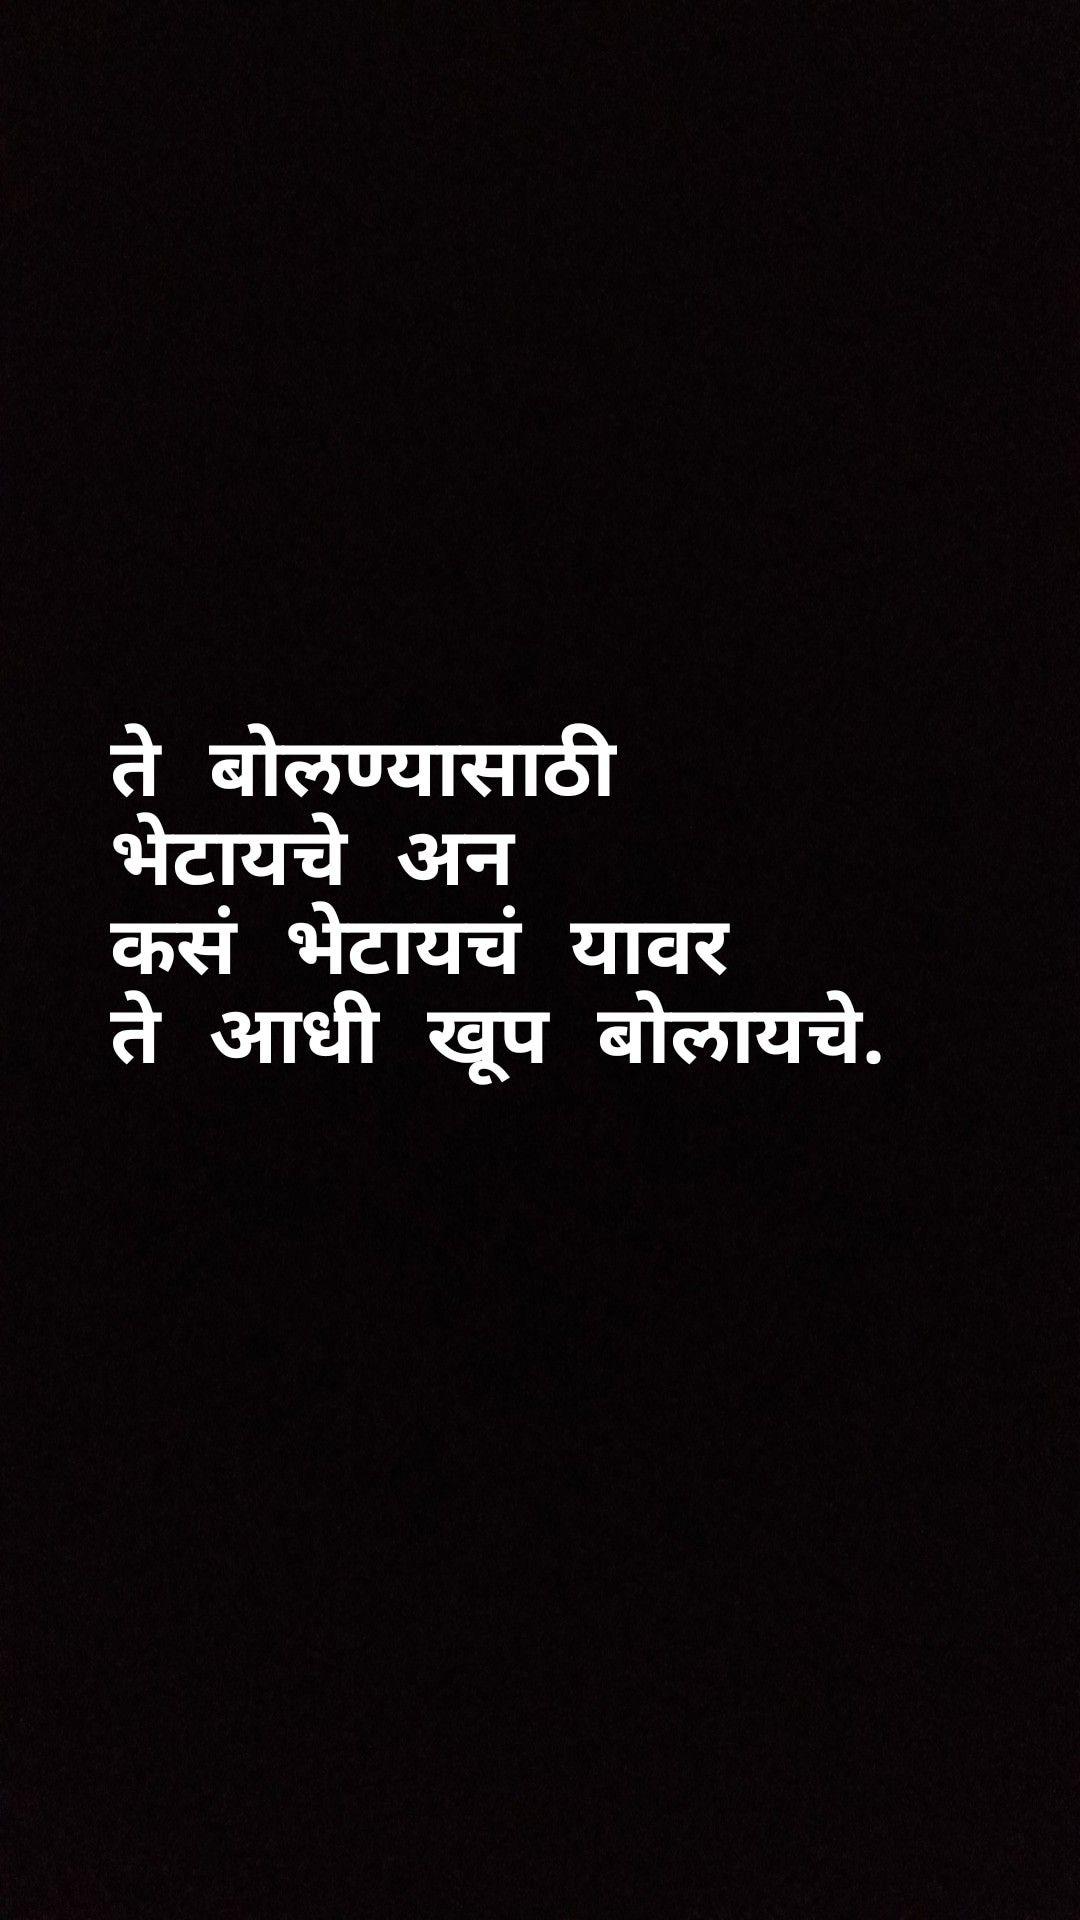 Pin By Kriti Belure On Marathi Marathi Love Quotes Crush Quotes Jokes Quotes